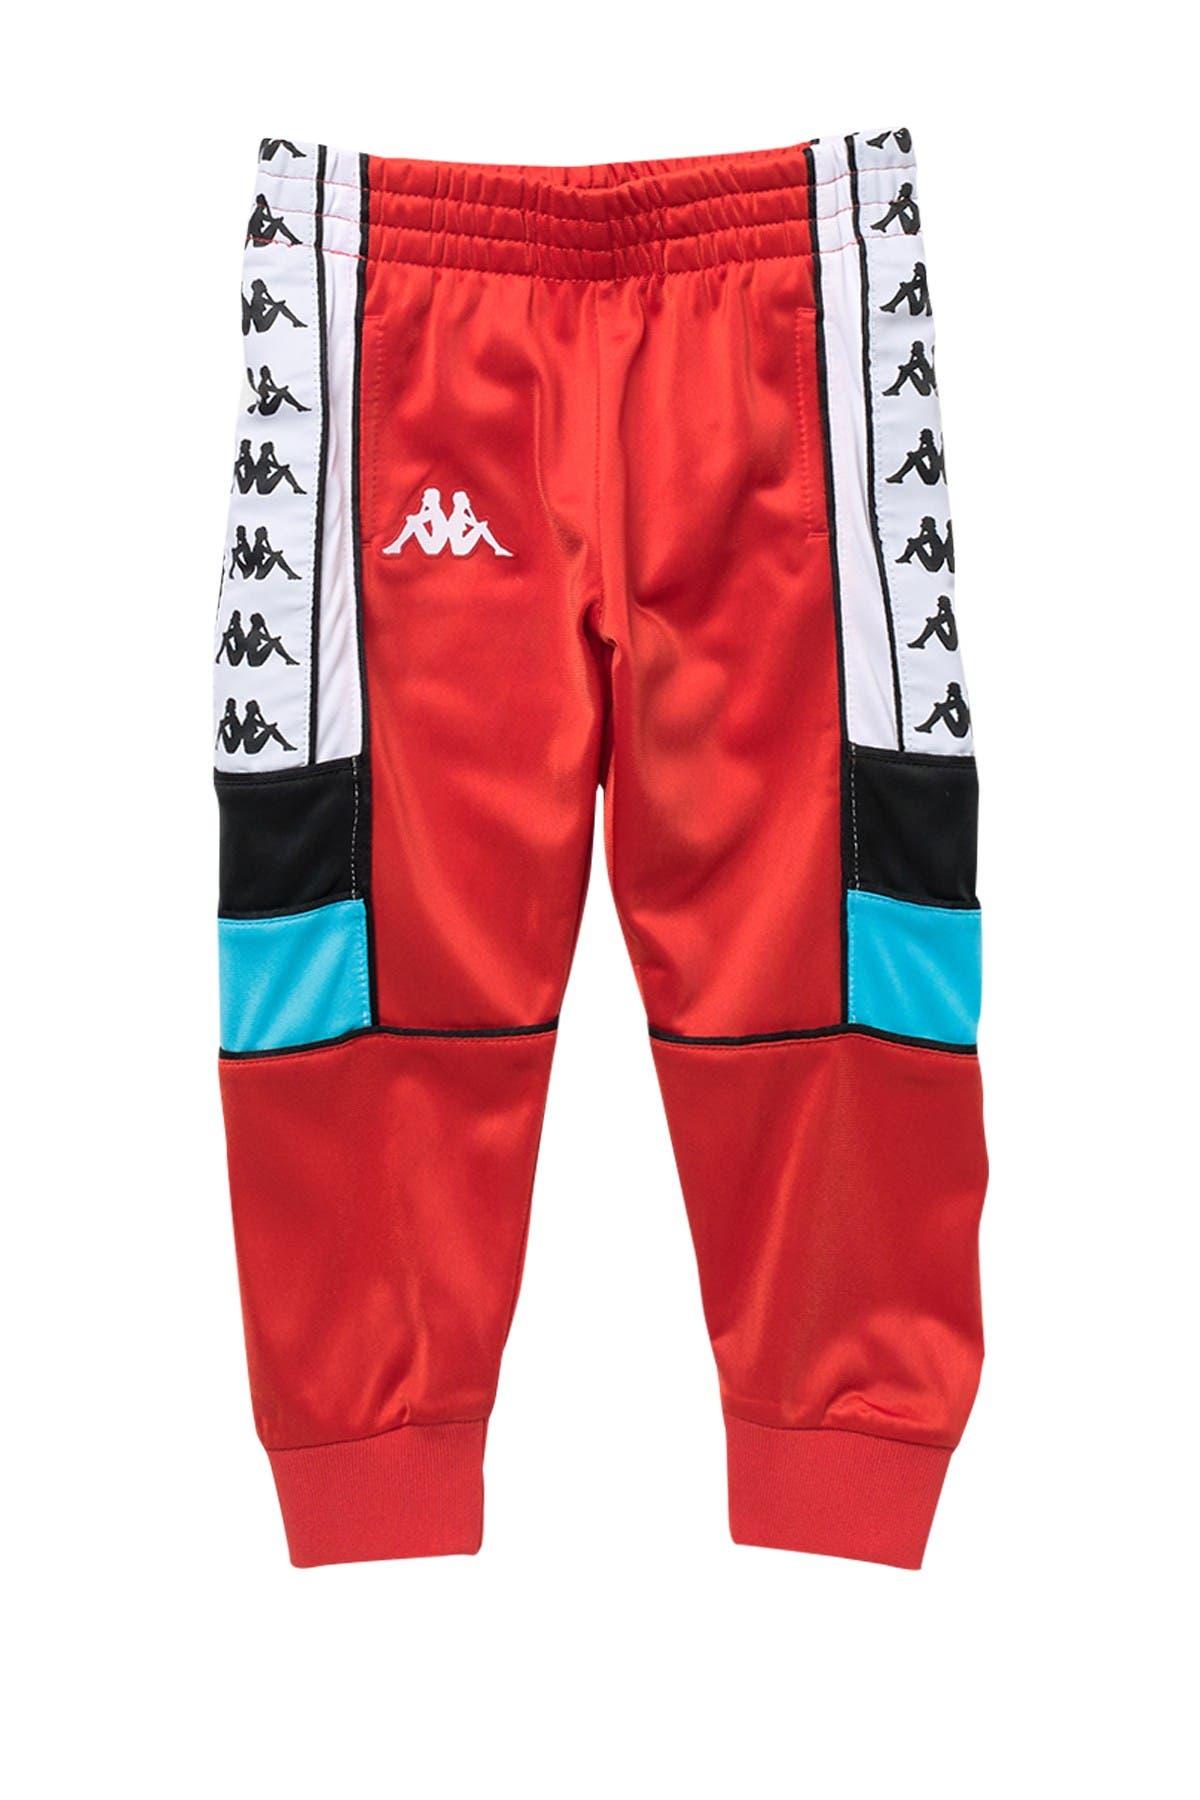 Image of Kappa Active 222 Banda Memzz Track Pants